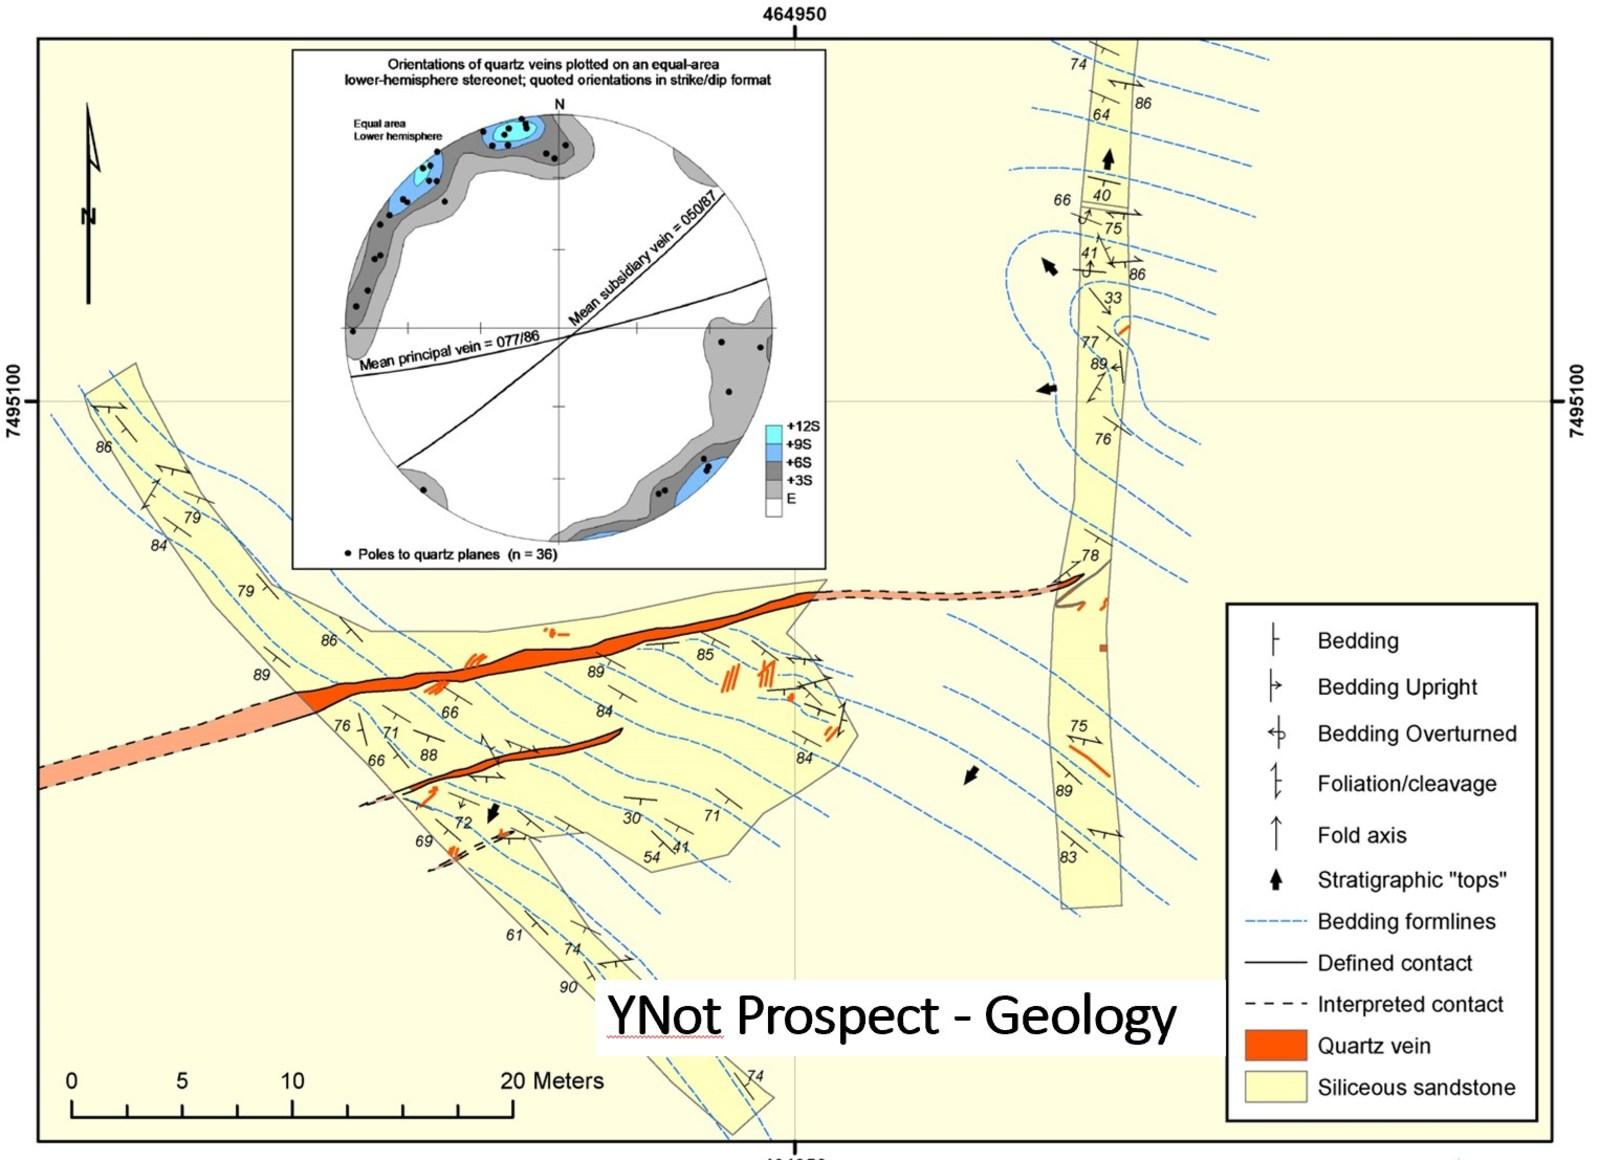 YNot Prospect - Geology